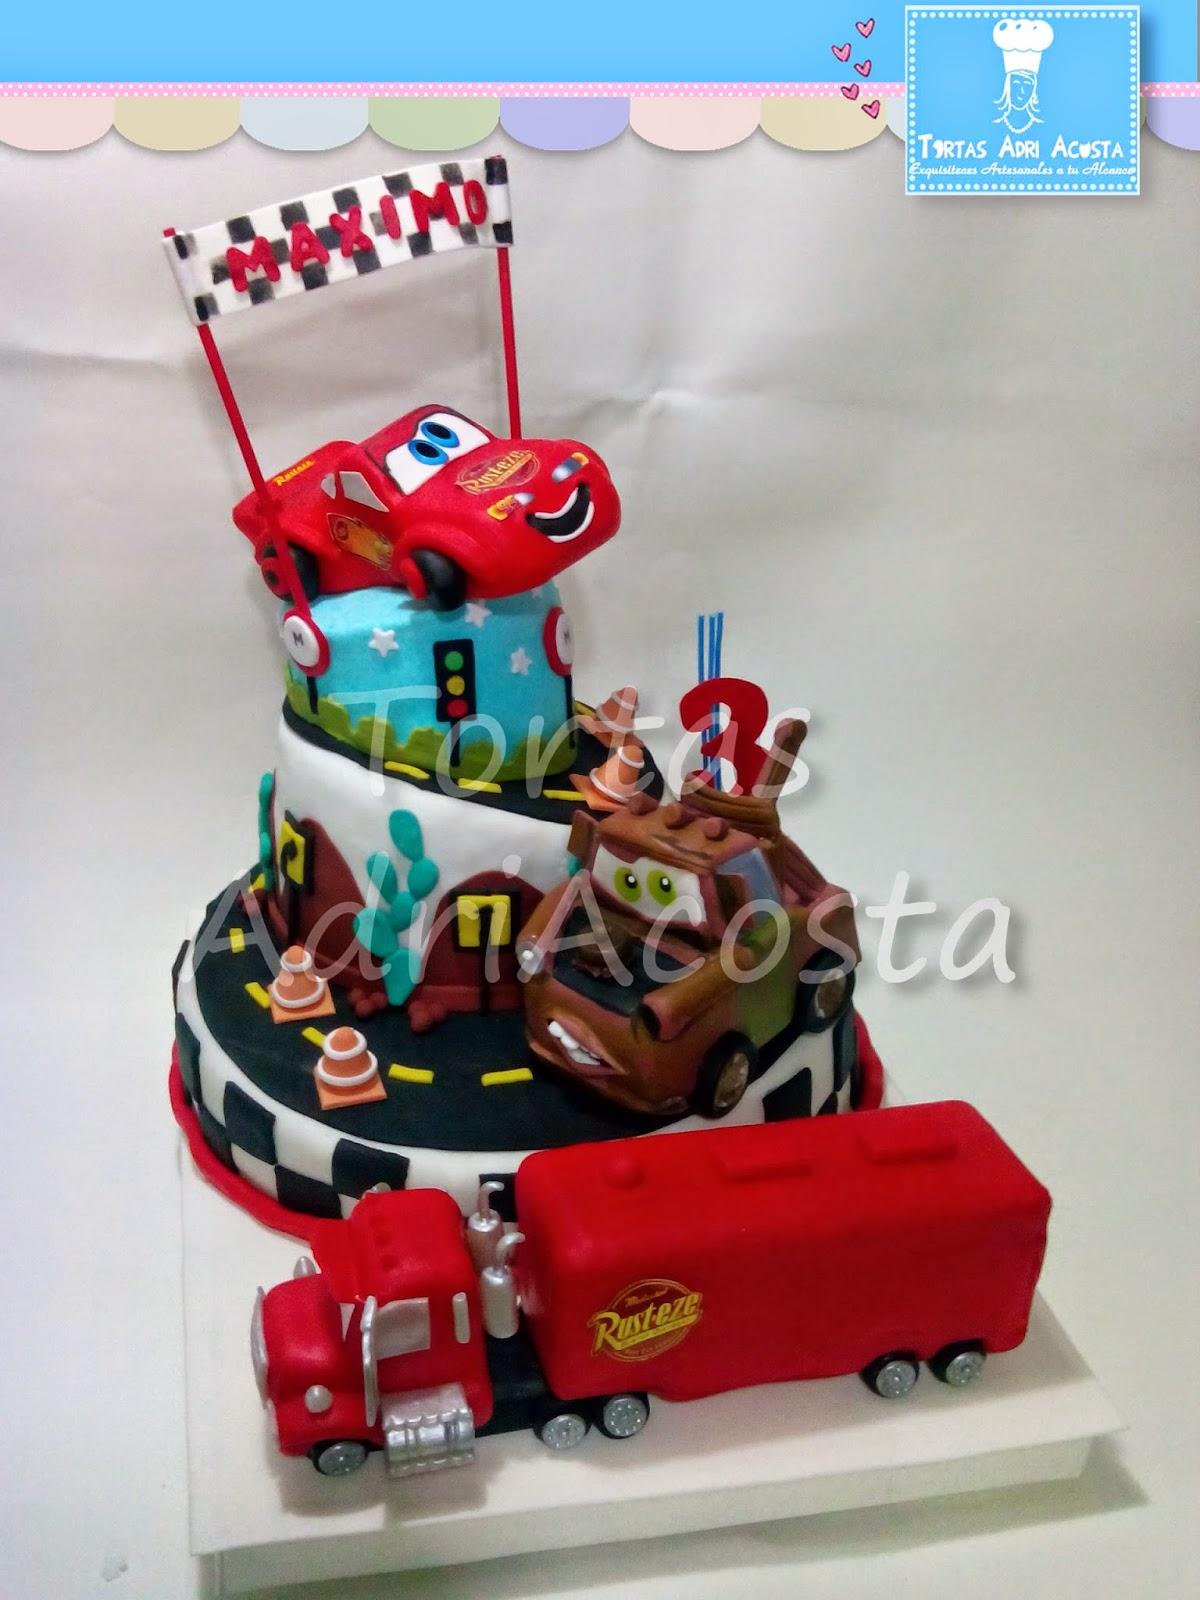 tortas adriana acosta infantiles tortas de cars holidays oo. Black Bedroom Furniture Sets. Home Design Ideas